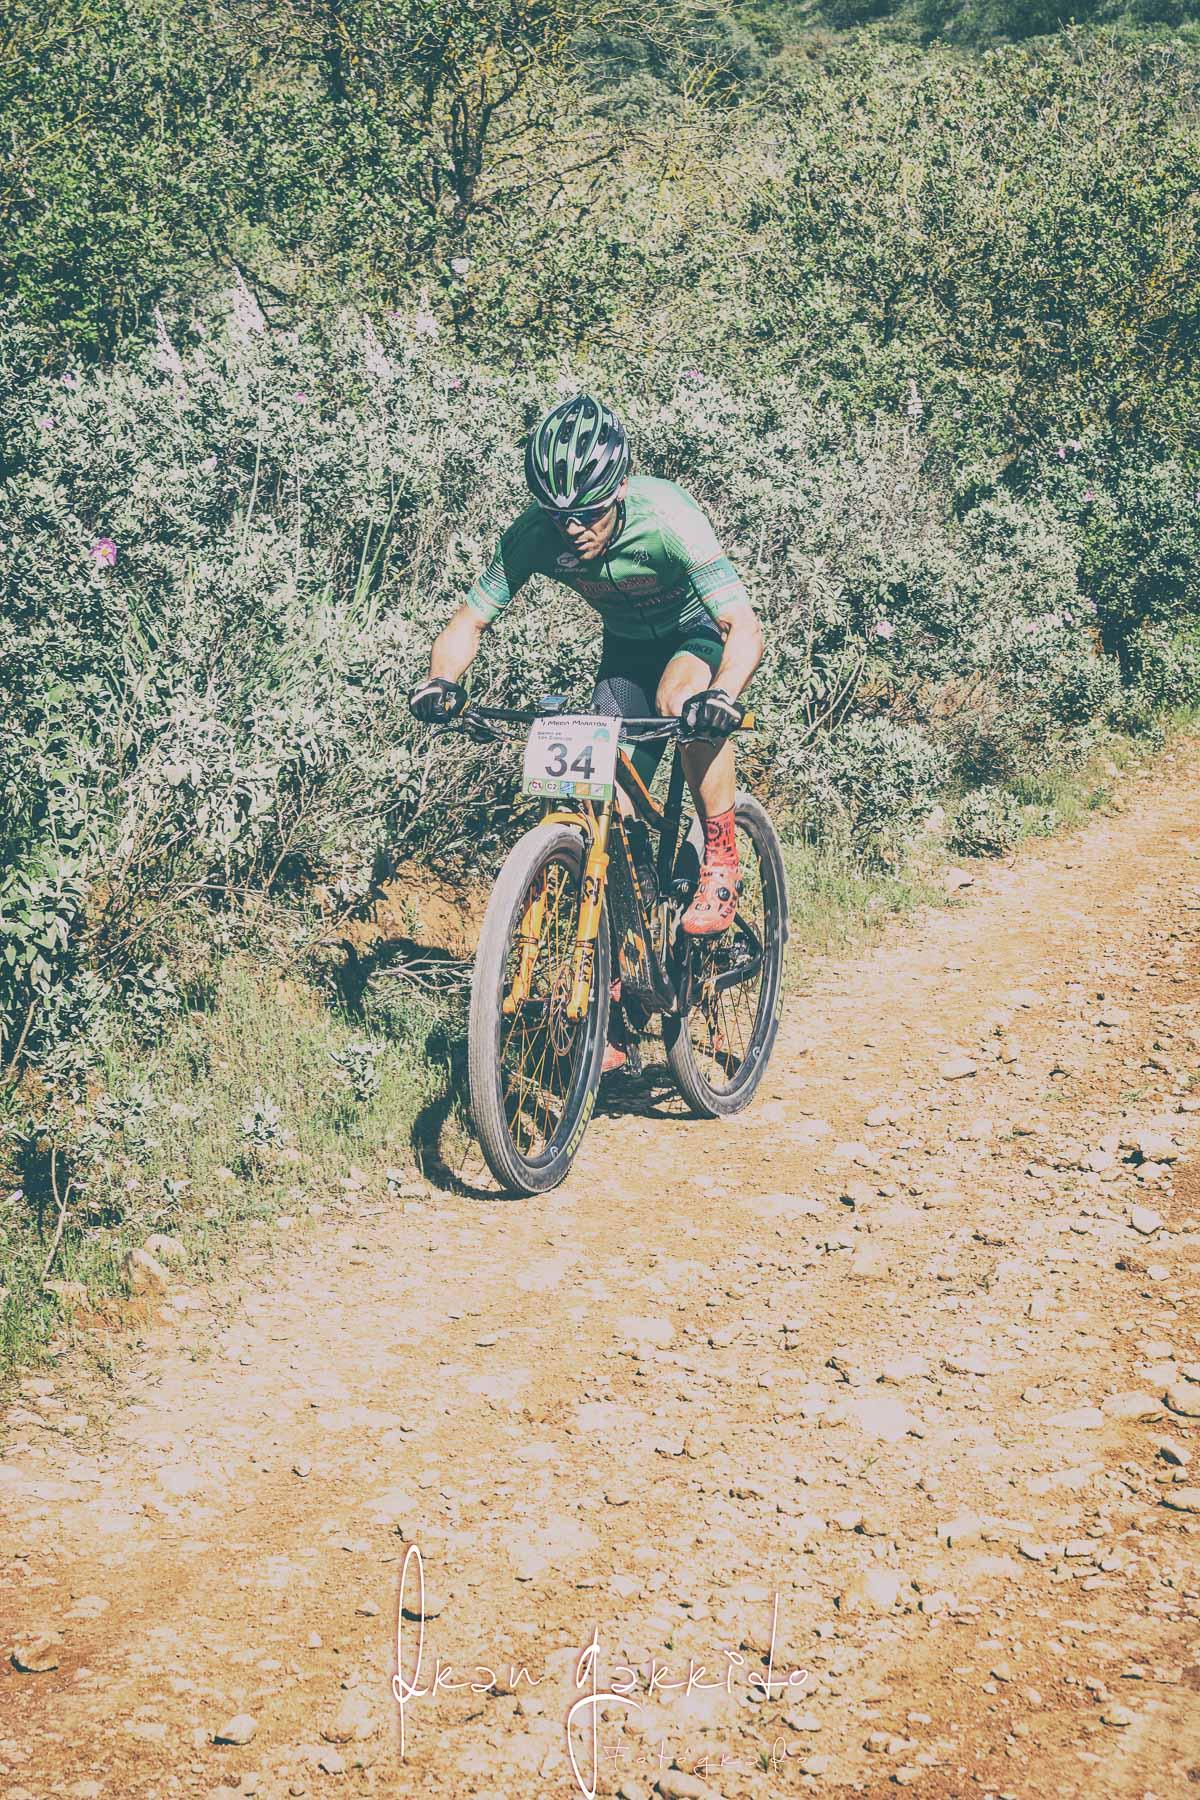 I Media Maratón Sierra de los Caballos - Sierra de Yeguas 2018